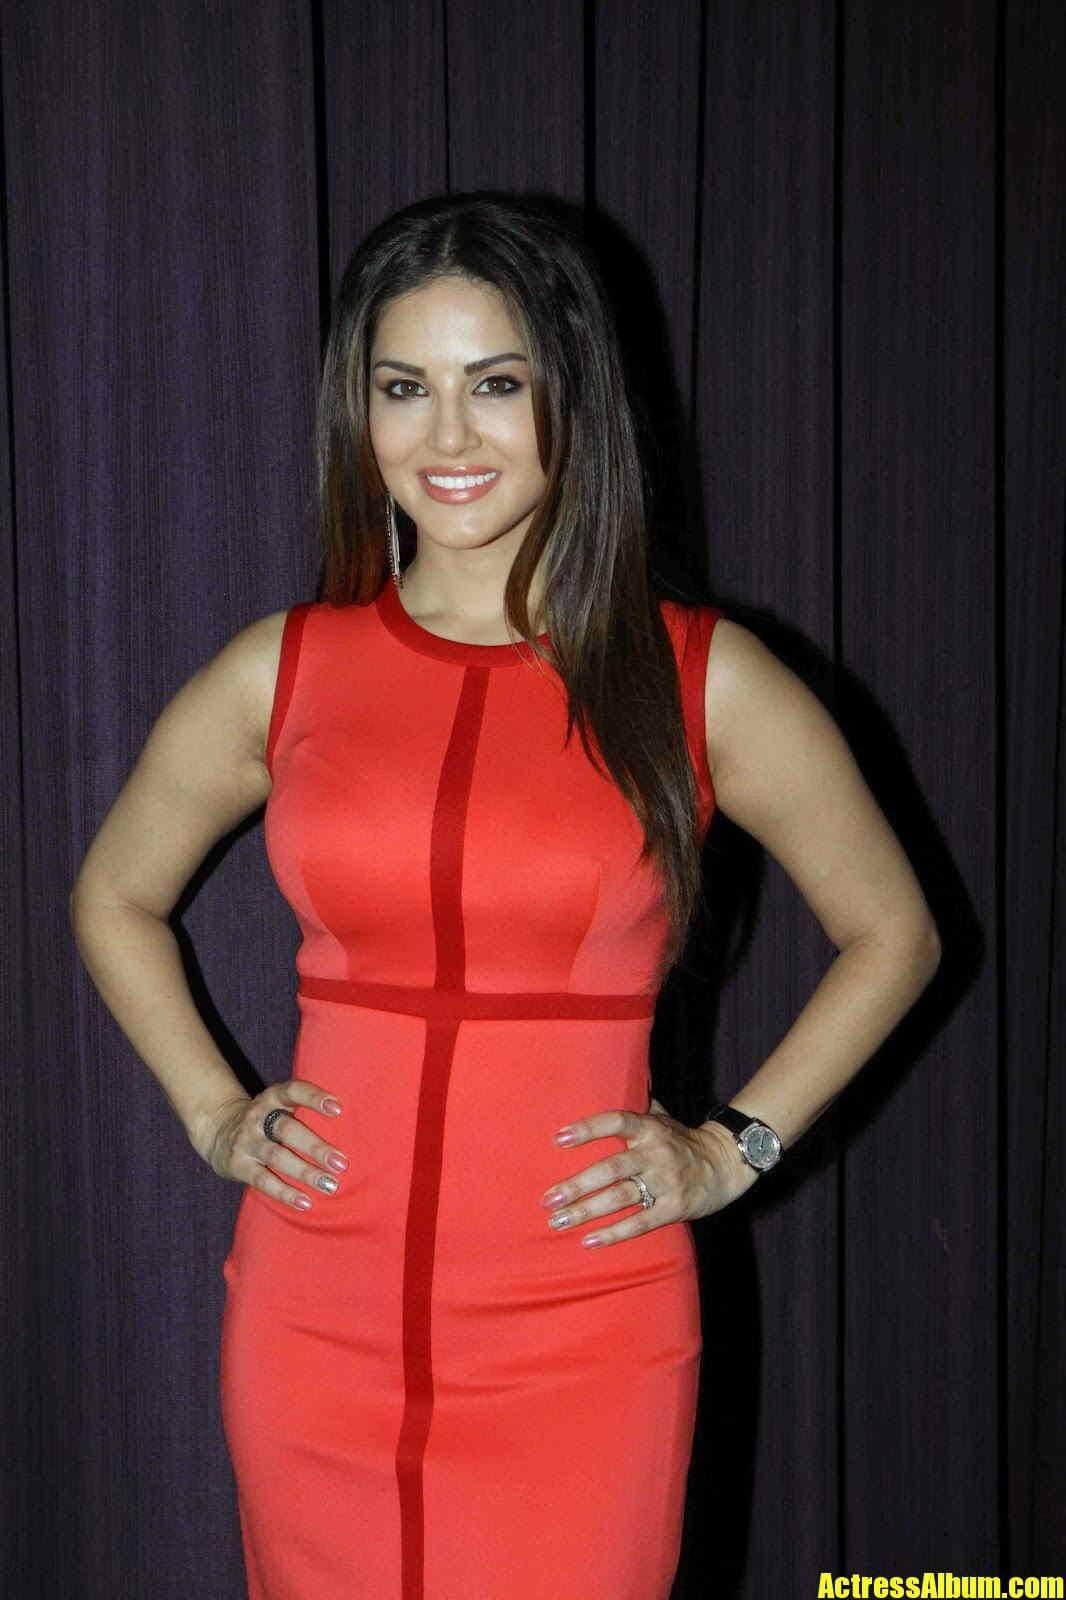 Sunny Leone Long Hair Stills In Maroon Dress - Actress Album-7238